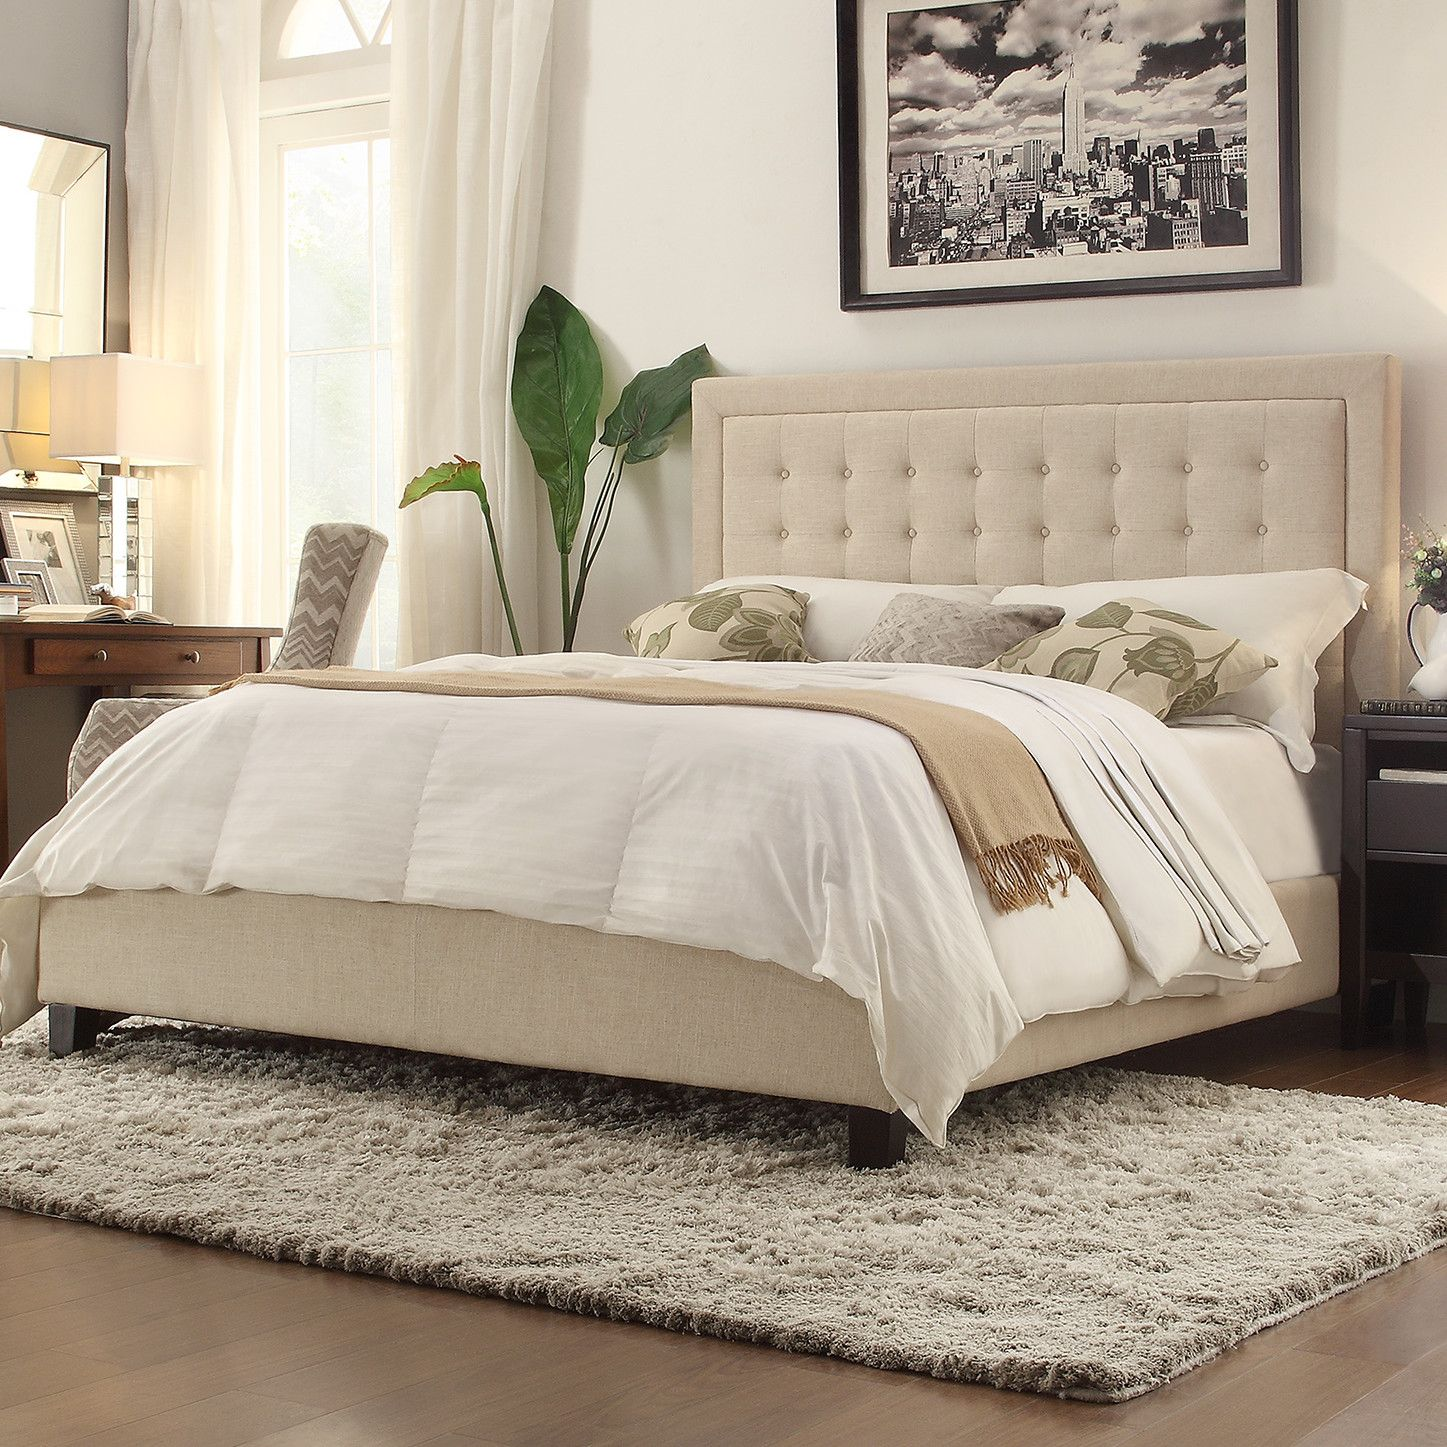 Kingstown Home Aurelia Panel Bed Upholstered panel bed